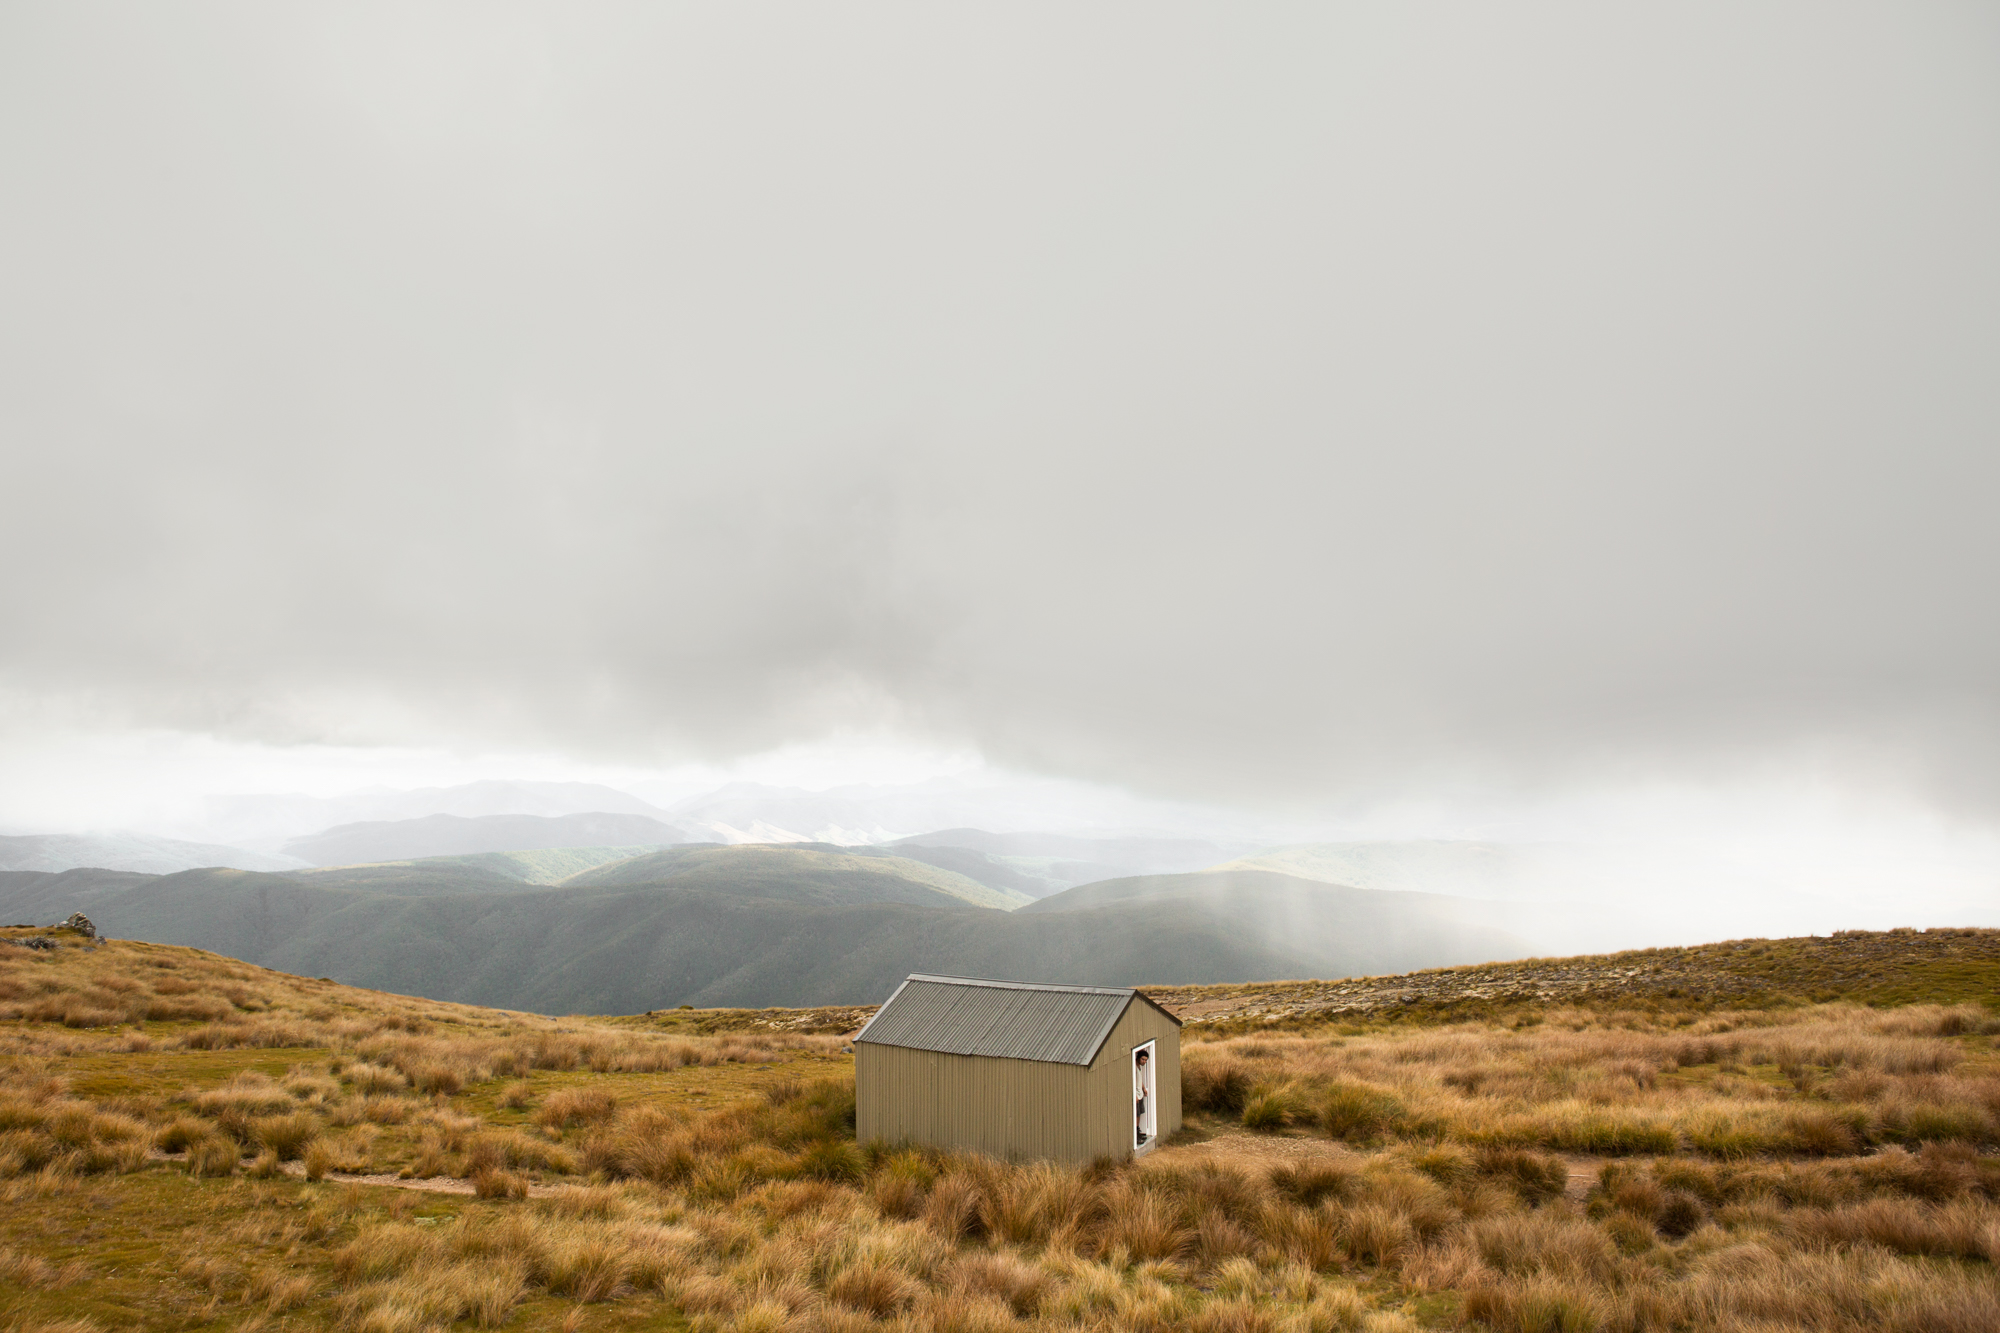 10-Bec_Kilpatrick_Photography_New_ZealandBEC_6947-Recovered